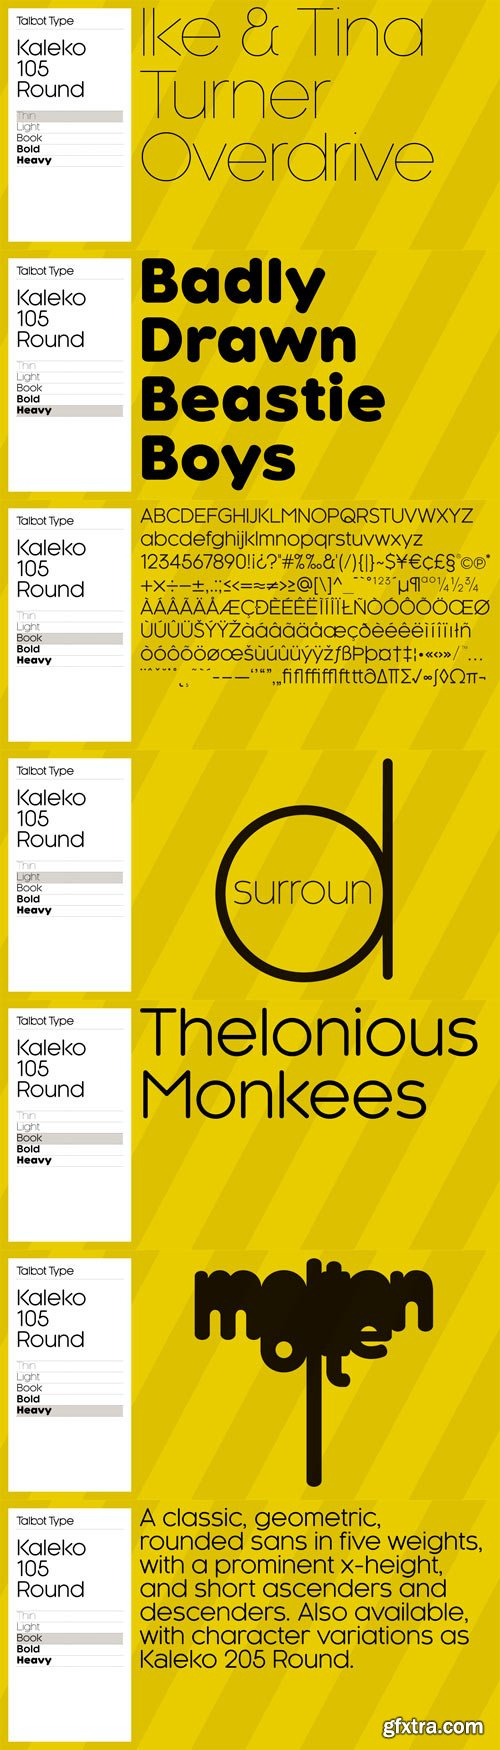 Kaleko 105 Round Font Family - 10 Fonts for $99